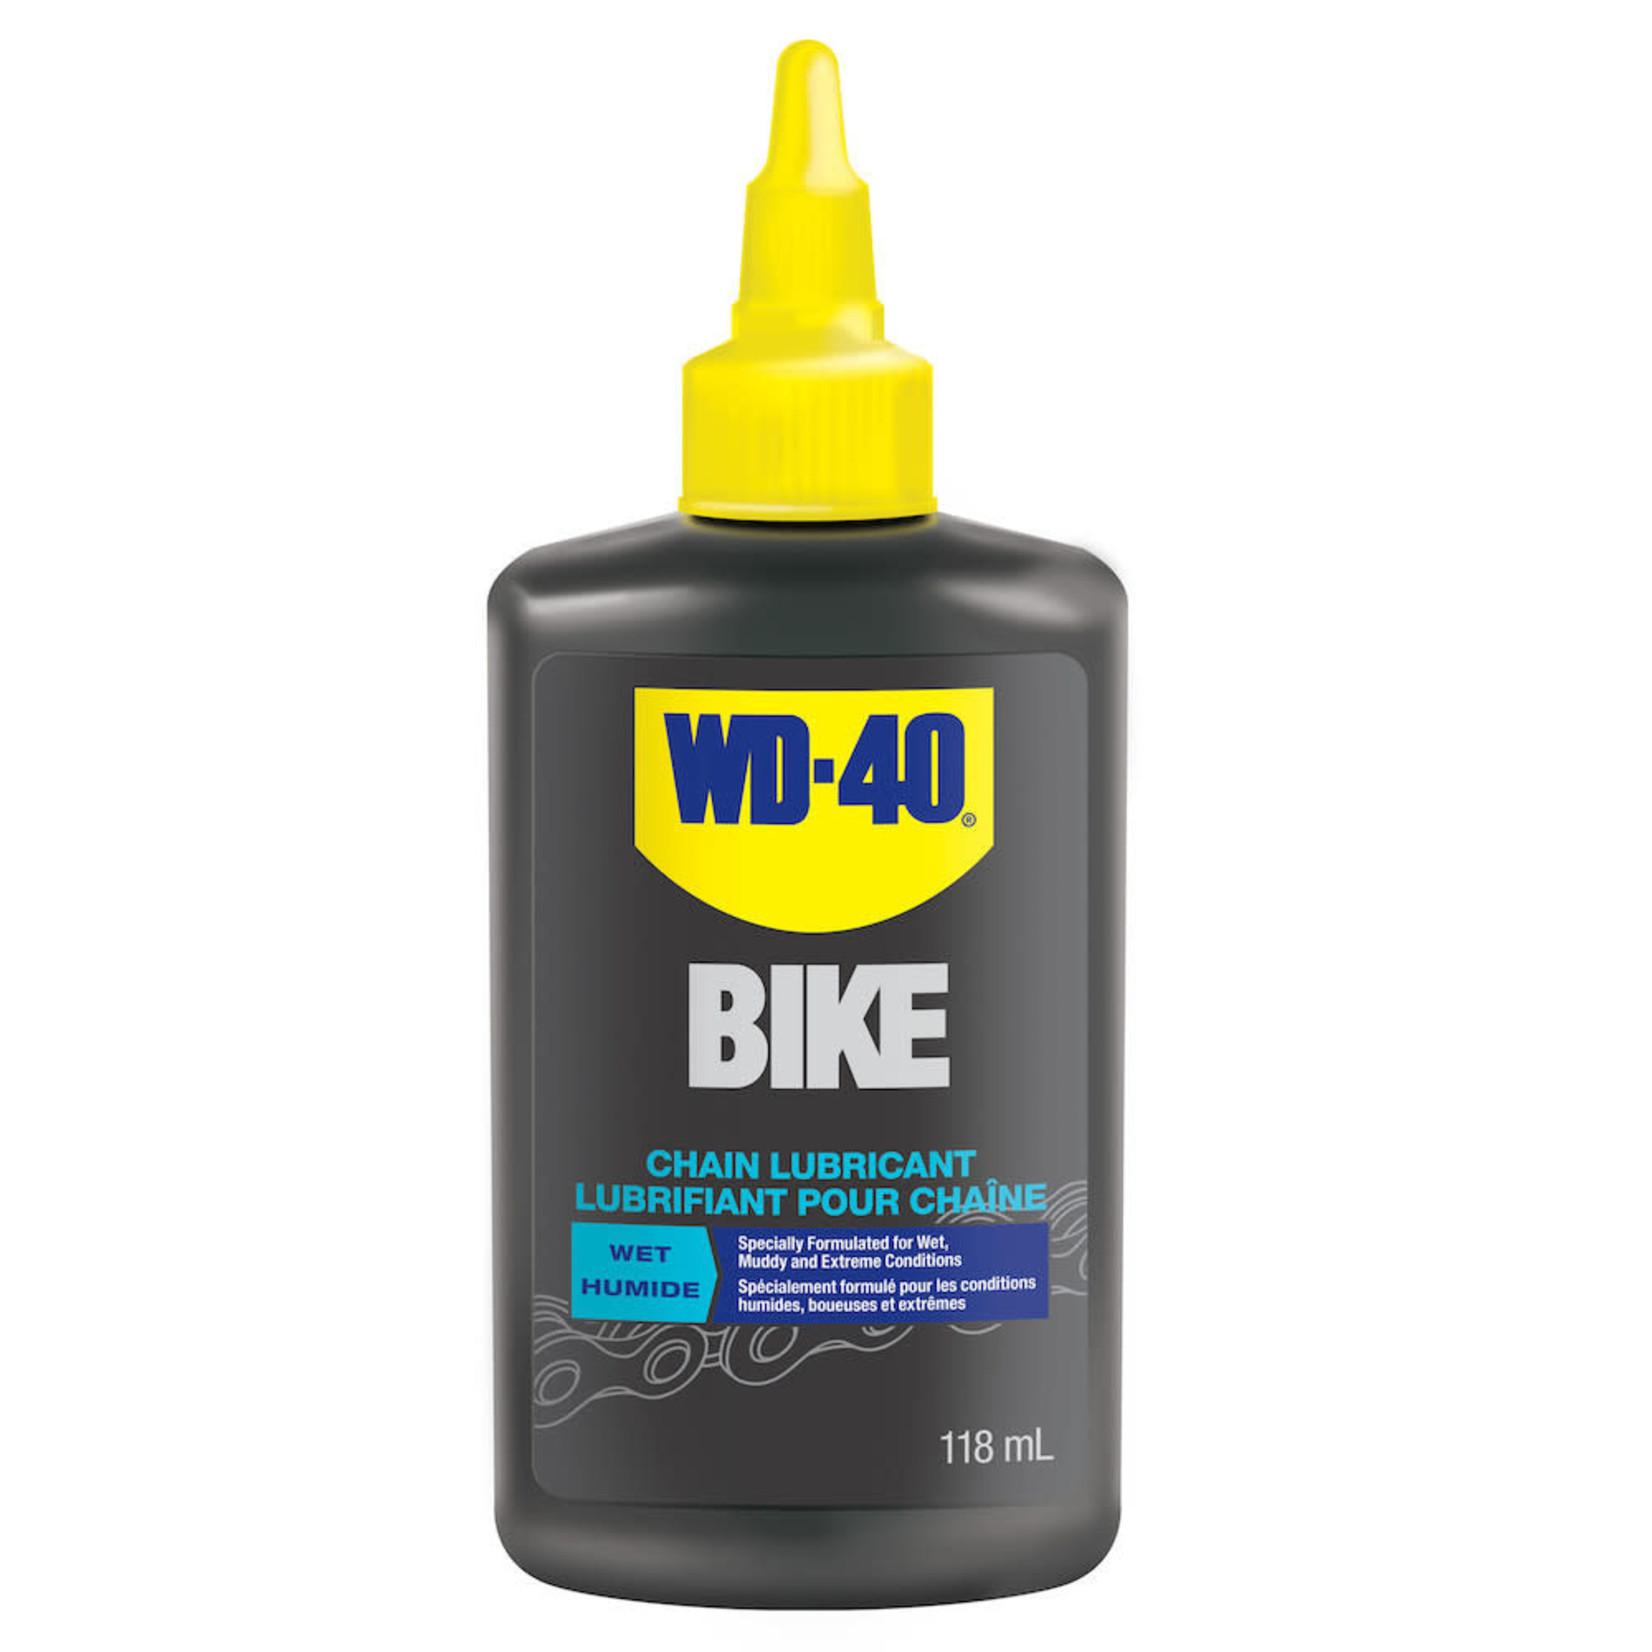 WD-40 WD-40 Bike Wet Chain lubricant 118ml